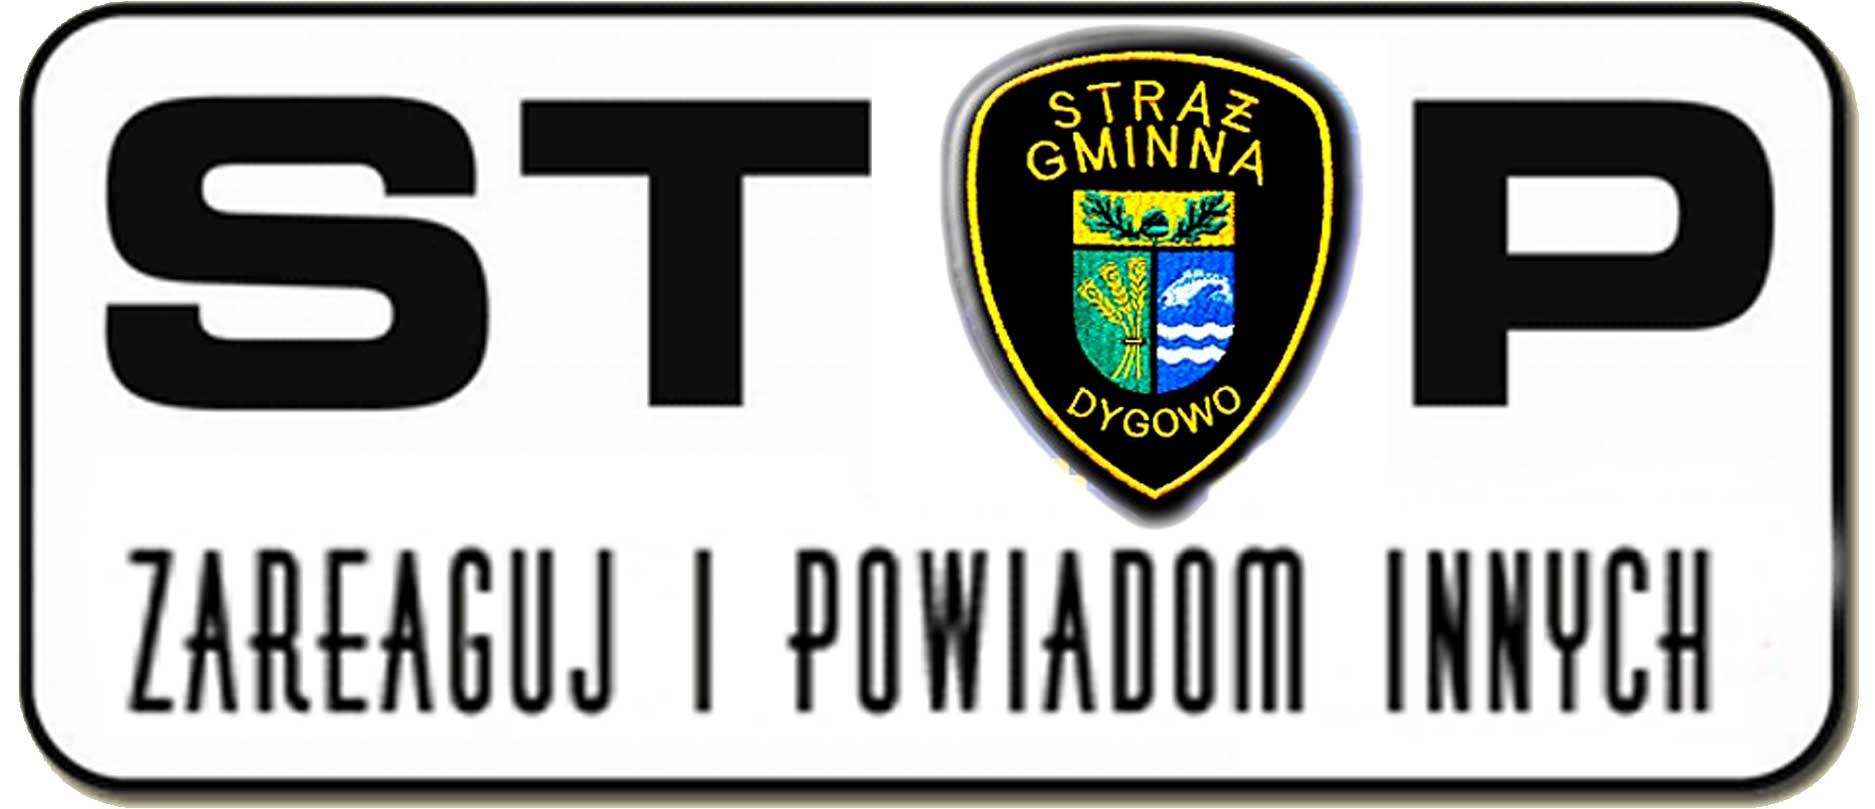 stop_oszustom_sg_dygowo_2